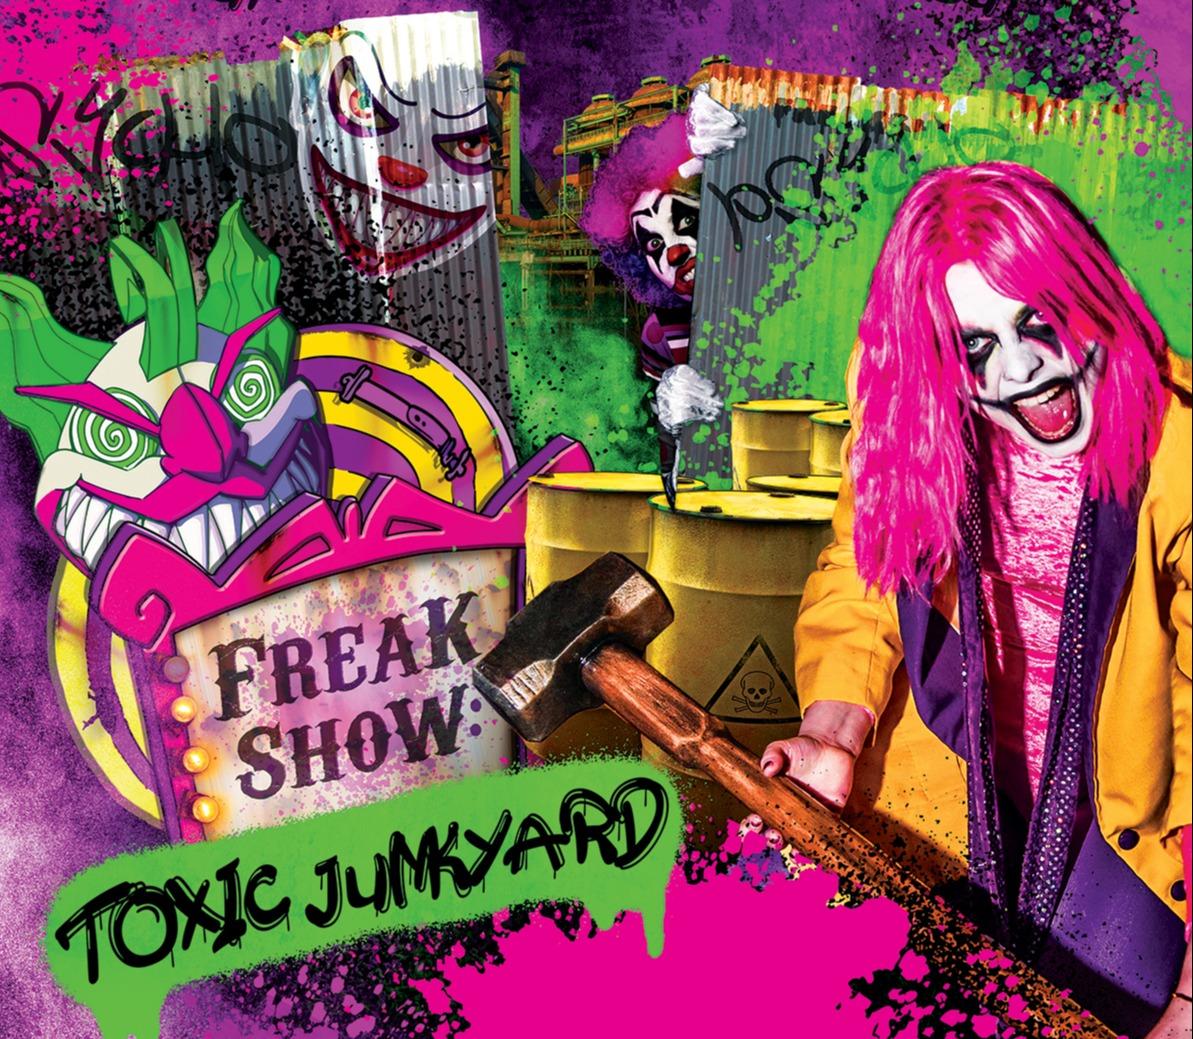 Alton Towers has announced their new Scarefest attraction - Freak Show: Toxic Junkyard